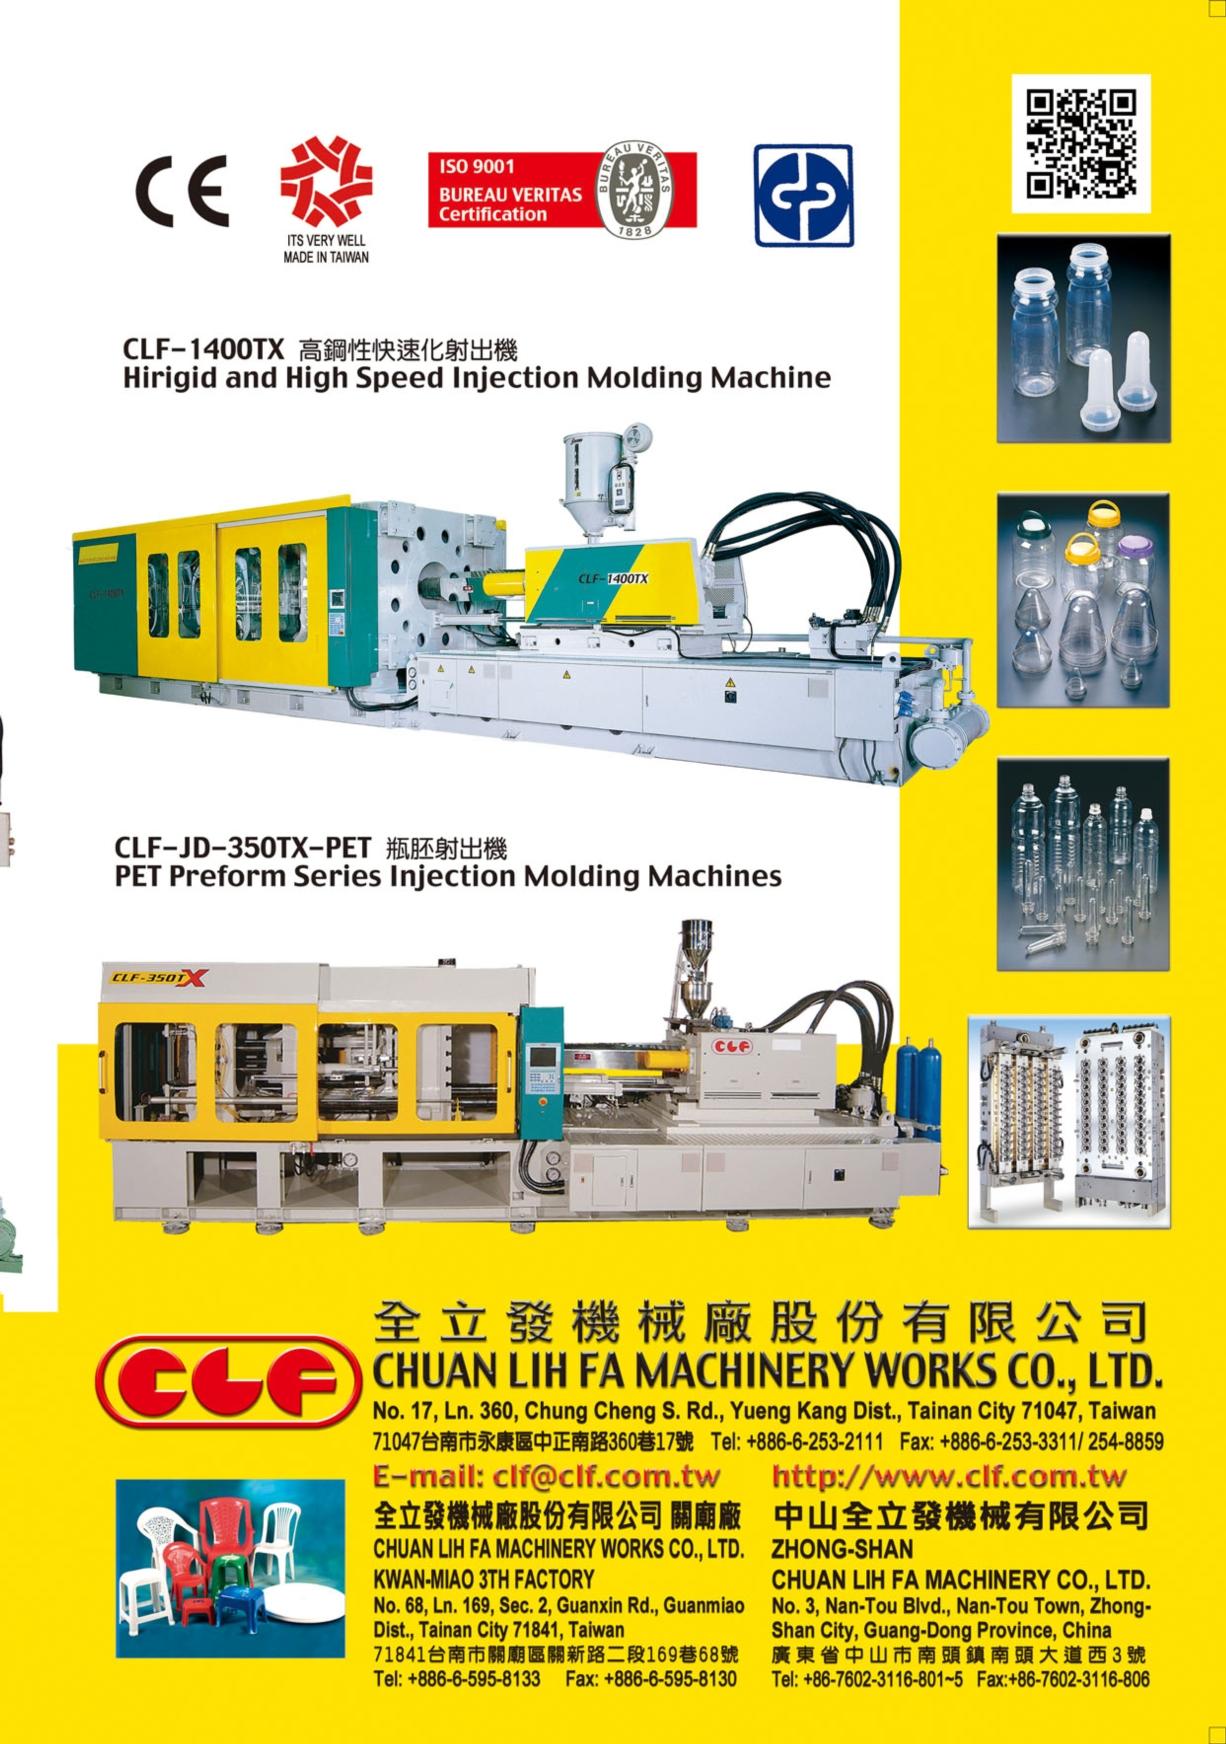 CHUAN LIH FA MACHINERY WORKS CO., LTD.